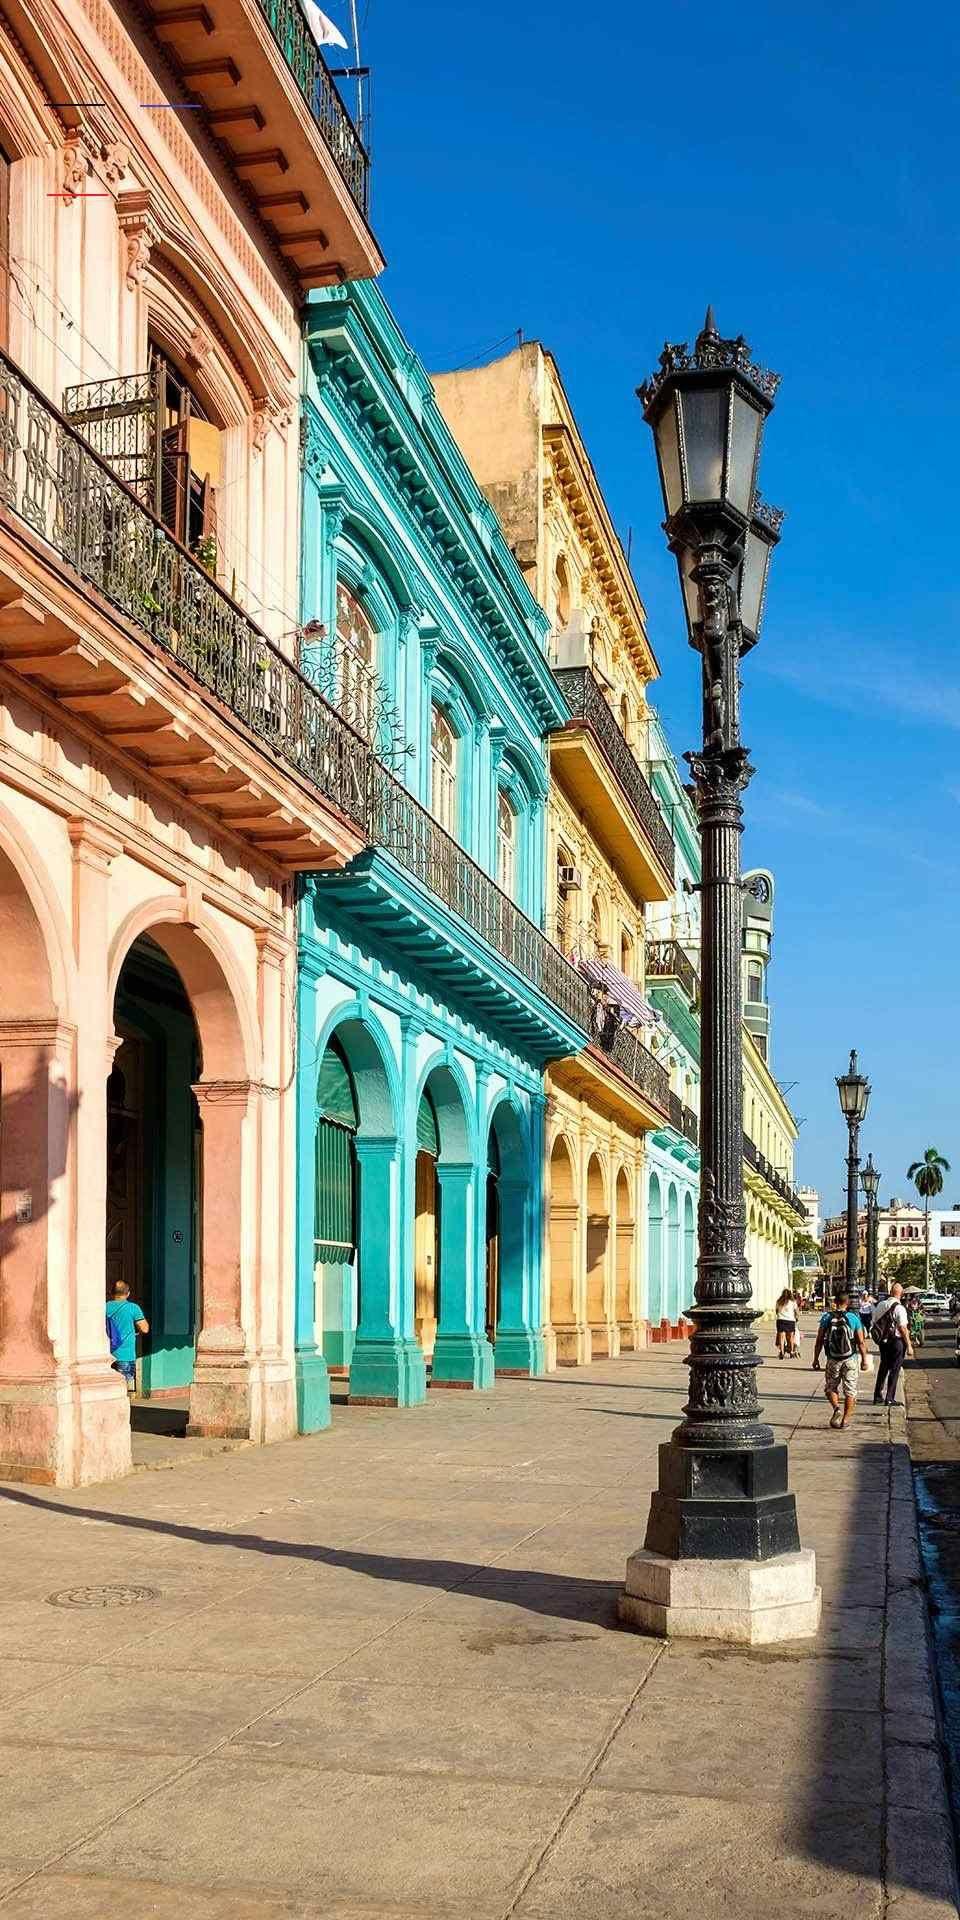 Caribbean Cruises: Start Your Caribbean Vacation | Royal Caribbean Cruises - #visitcuba